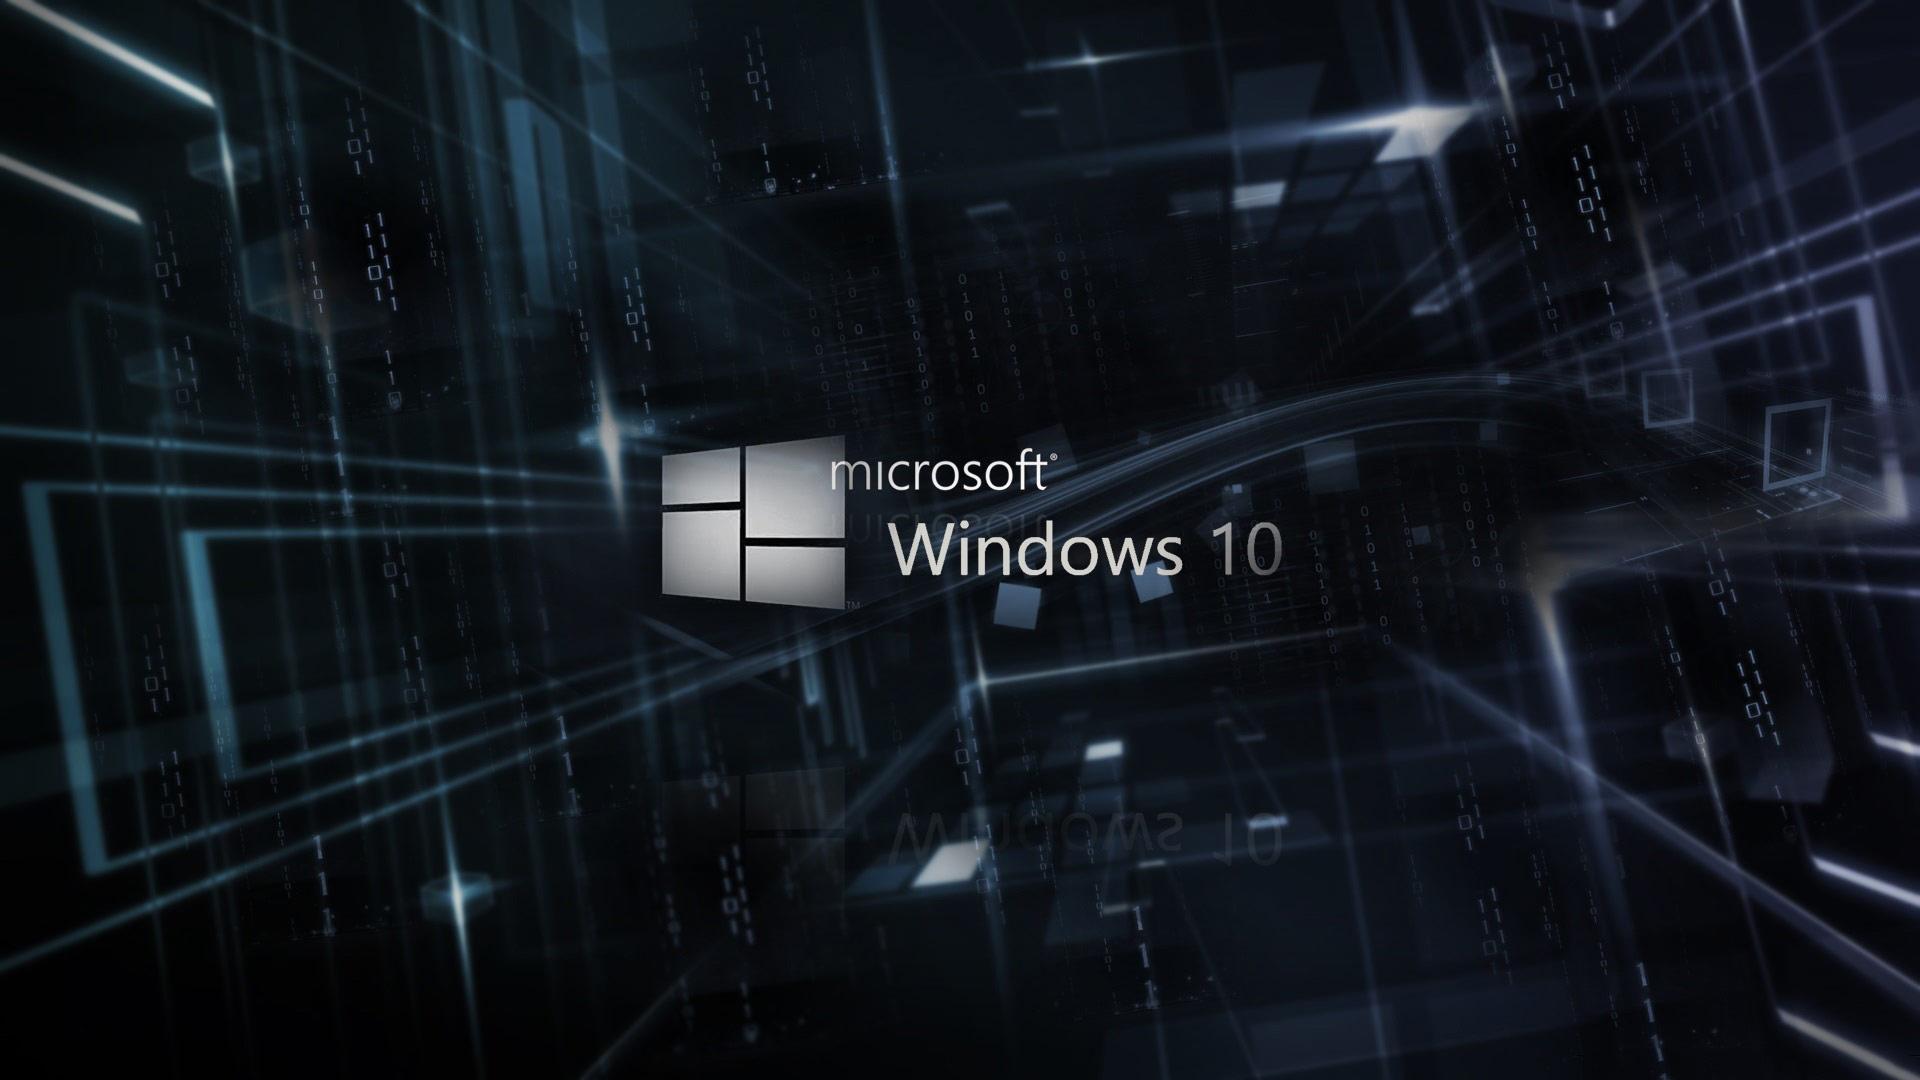 hd windows 10 wallpaper | hd wallpapers pulse